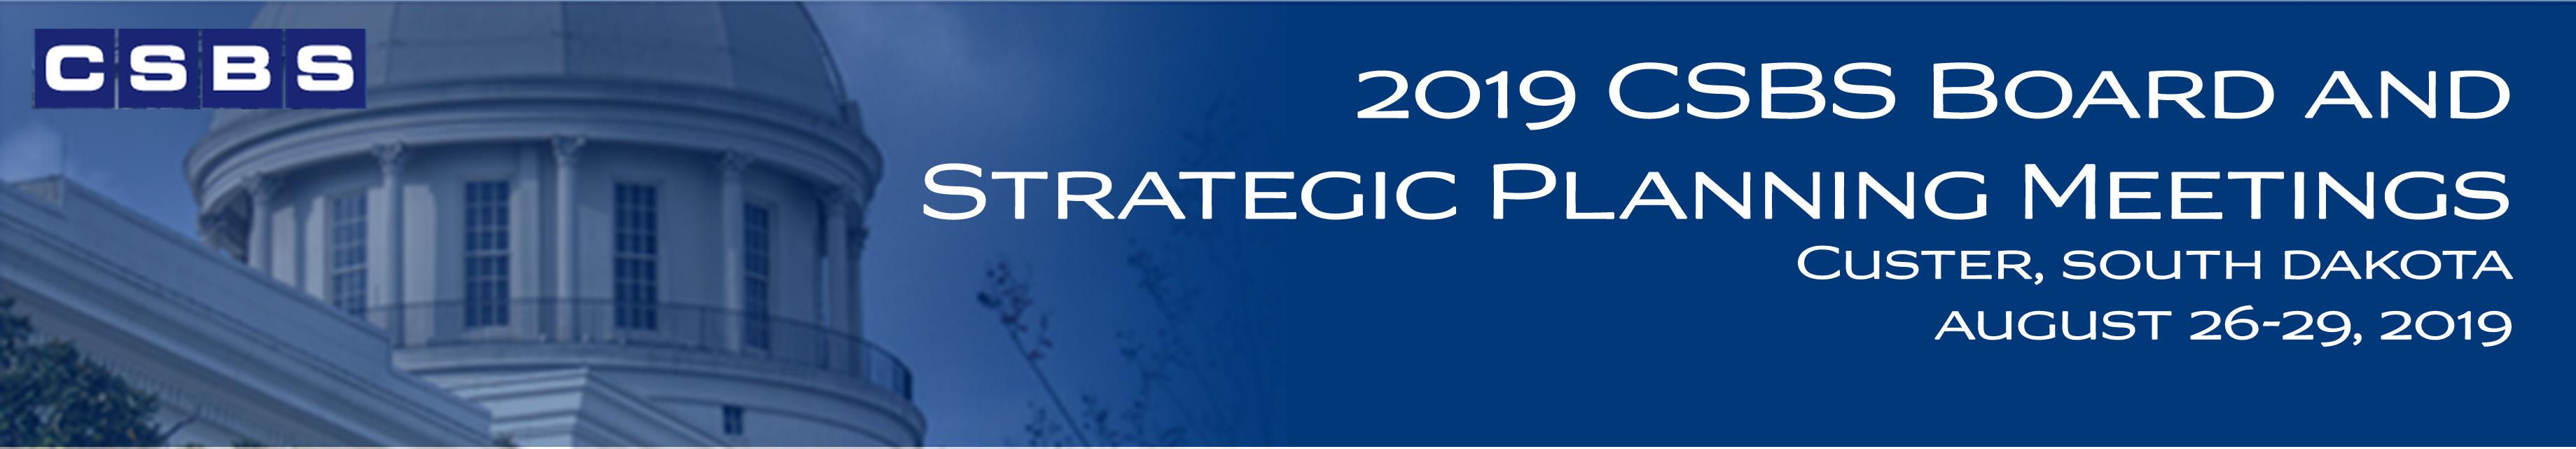 2019 CSBS Board and Strategic Planning Meetings